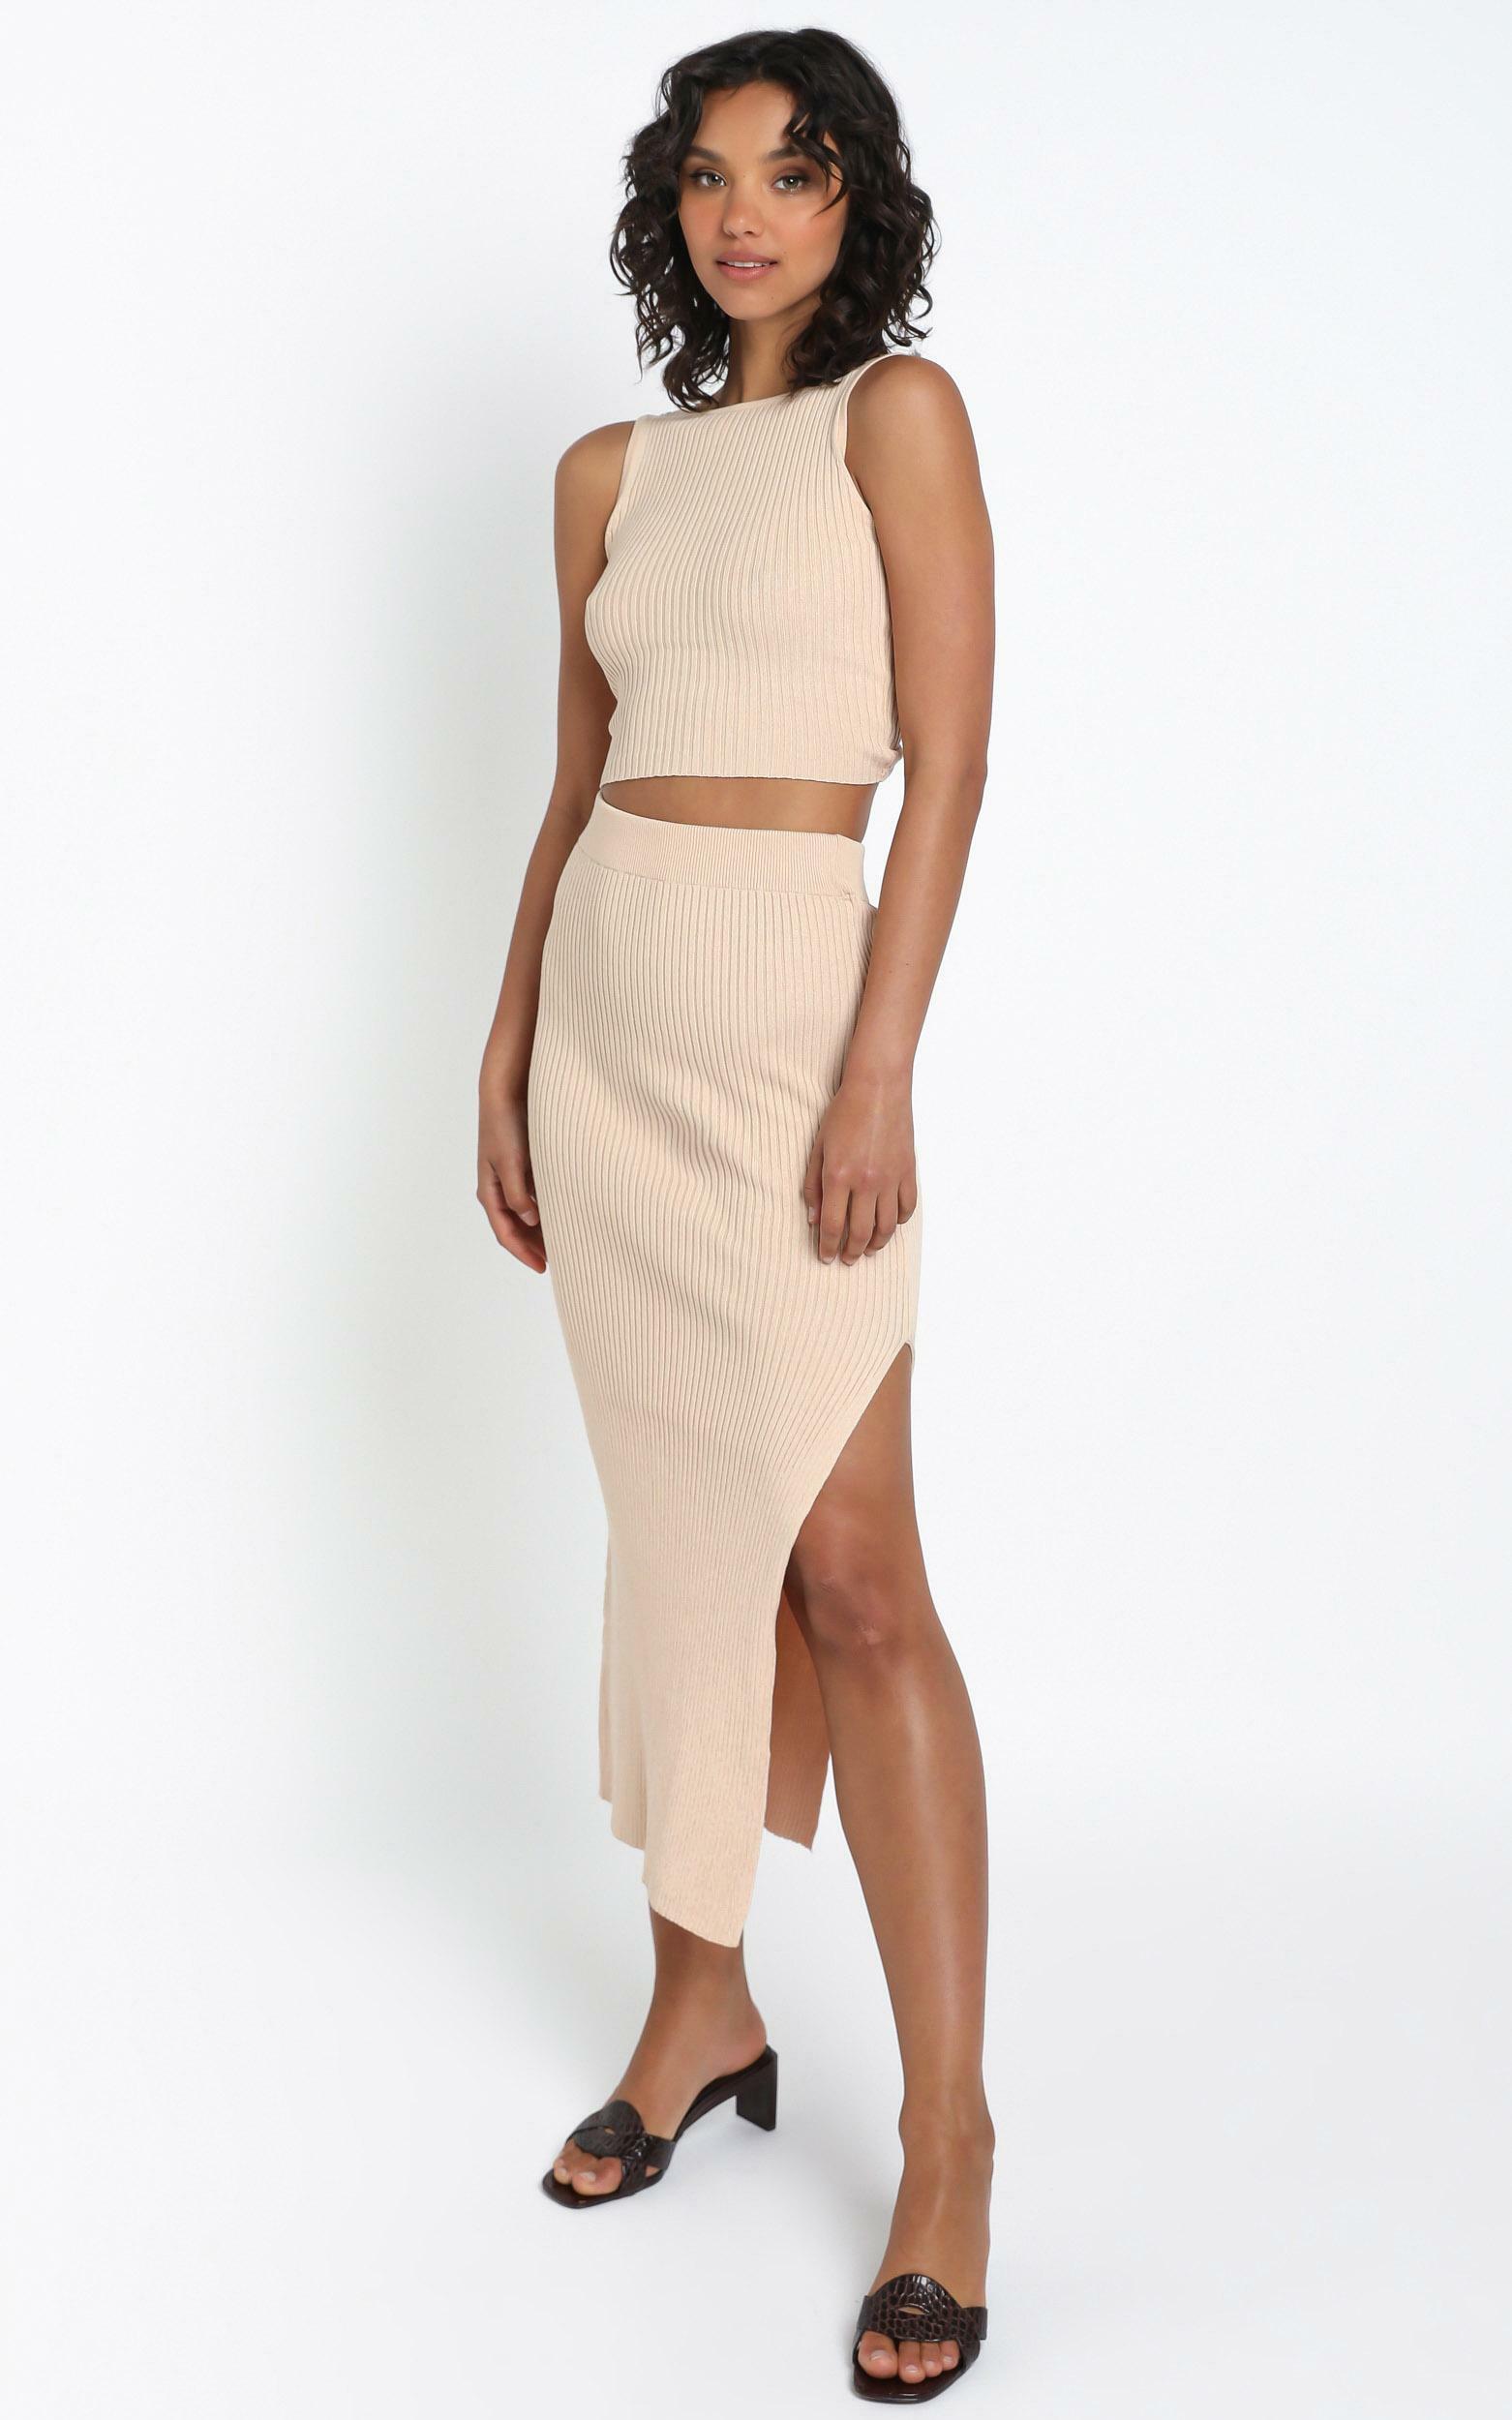 Hana Knit Skirt in Beige - 12 (L), CRE1, hi-res image number null